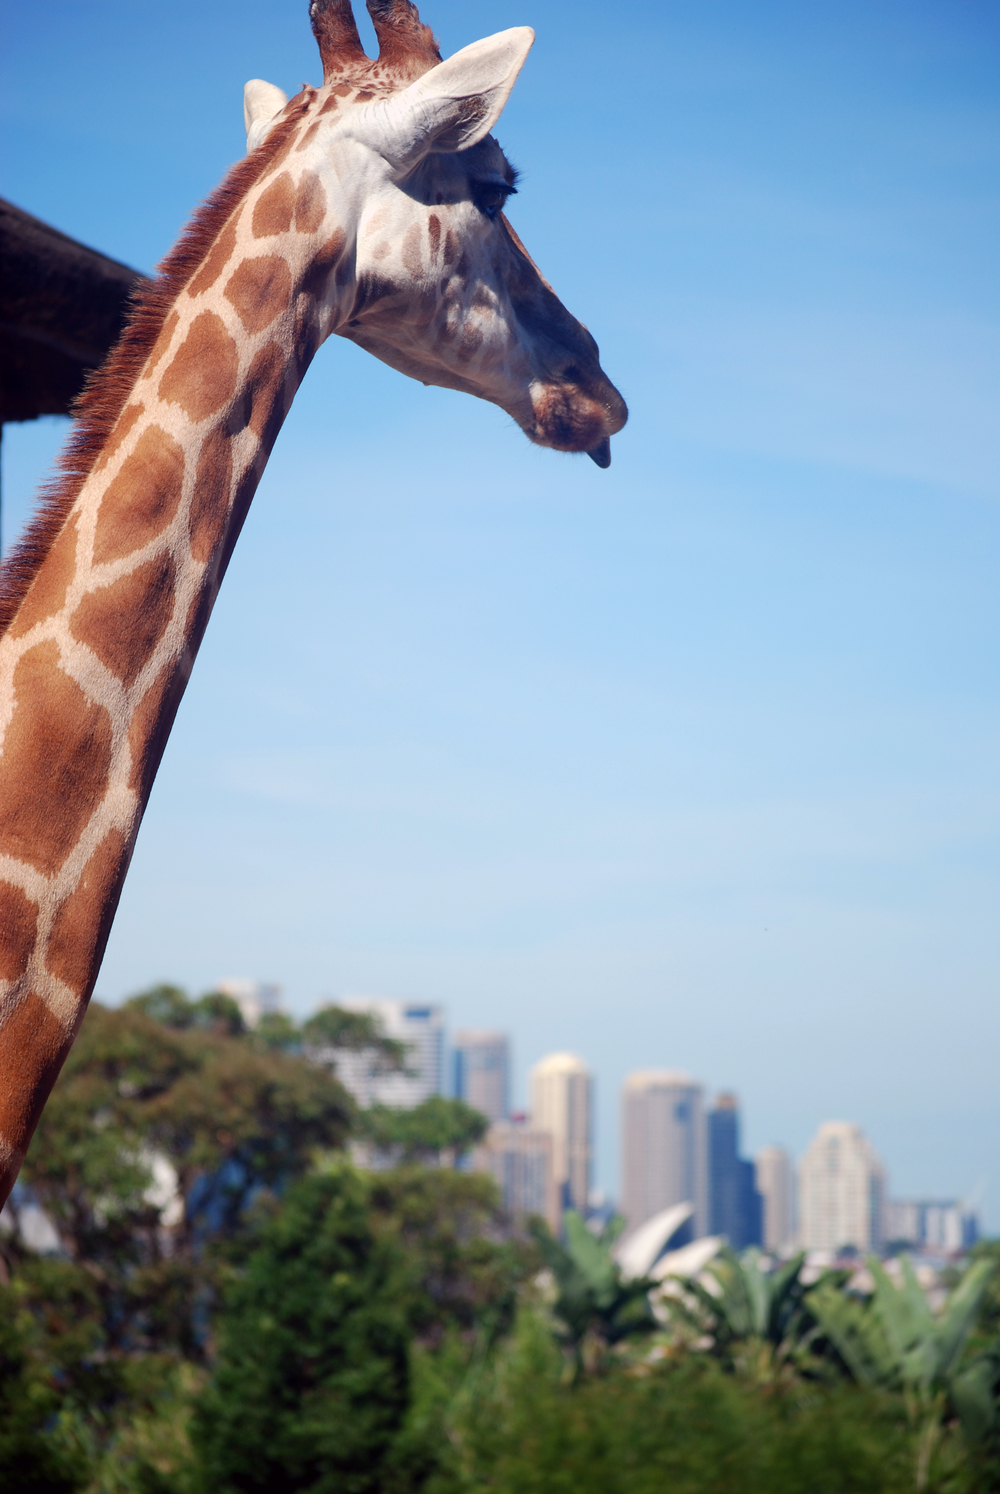 Giraffe mocking the Sydney skyline. Sydney, New South Wales, 2012.